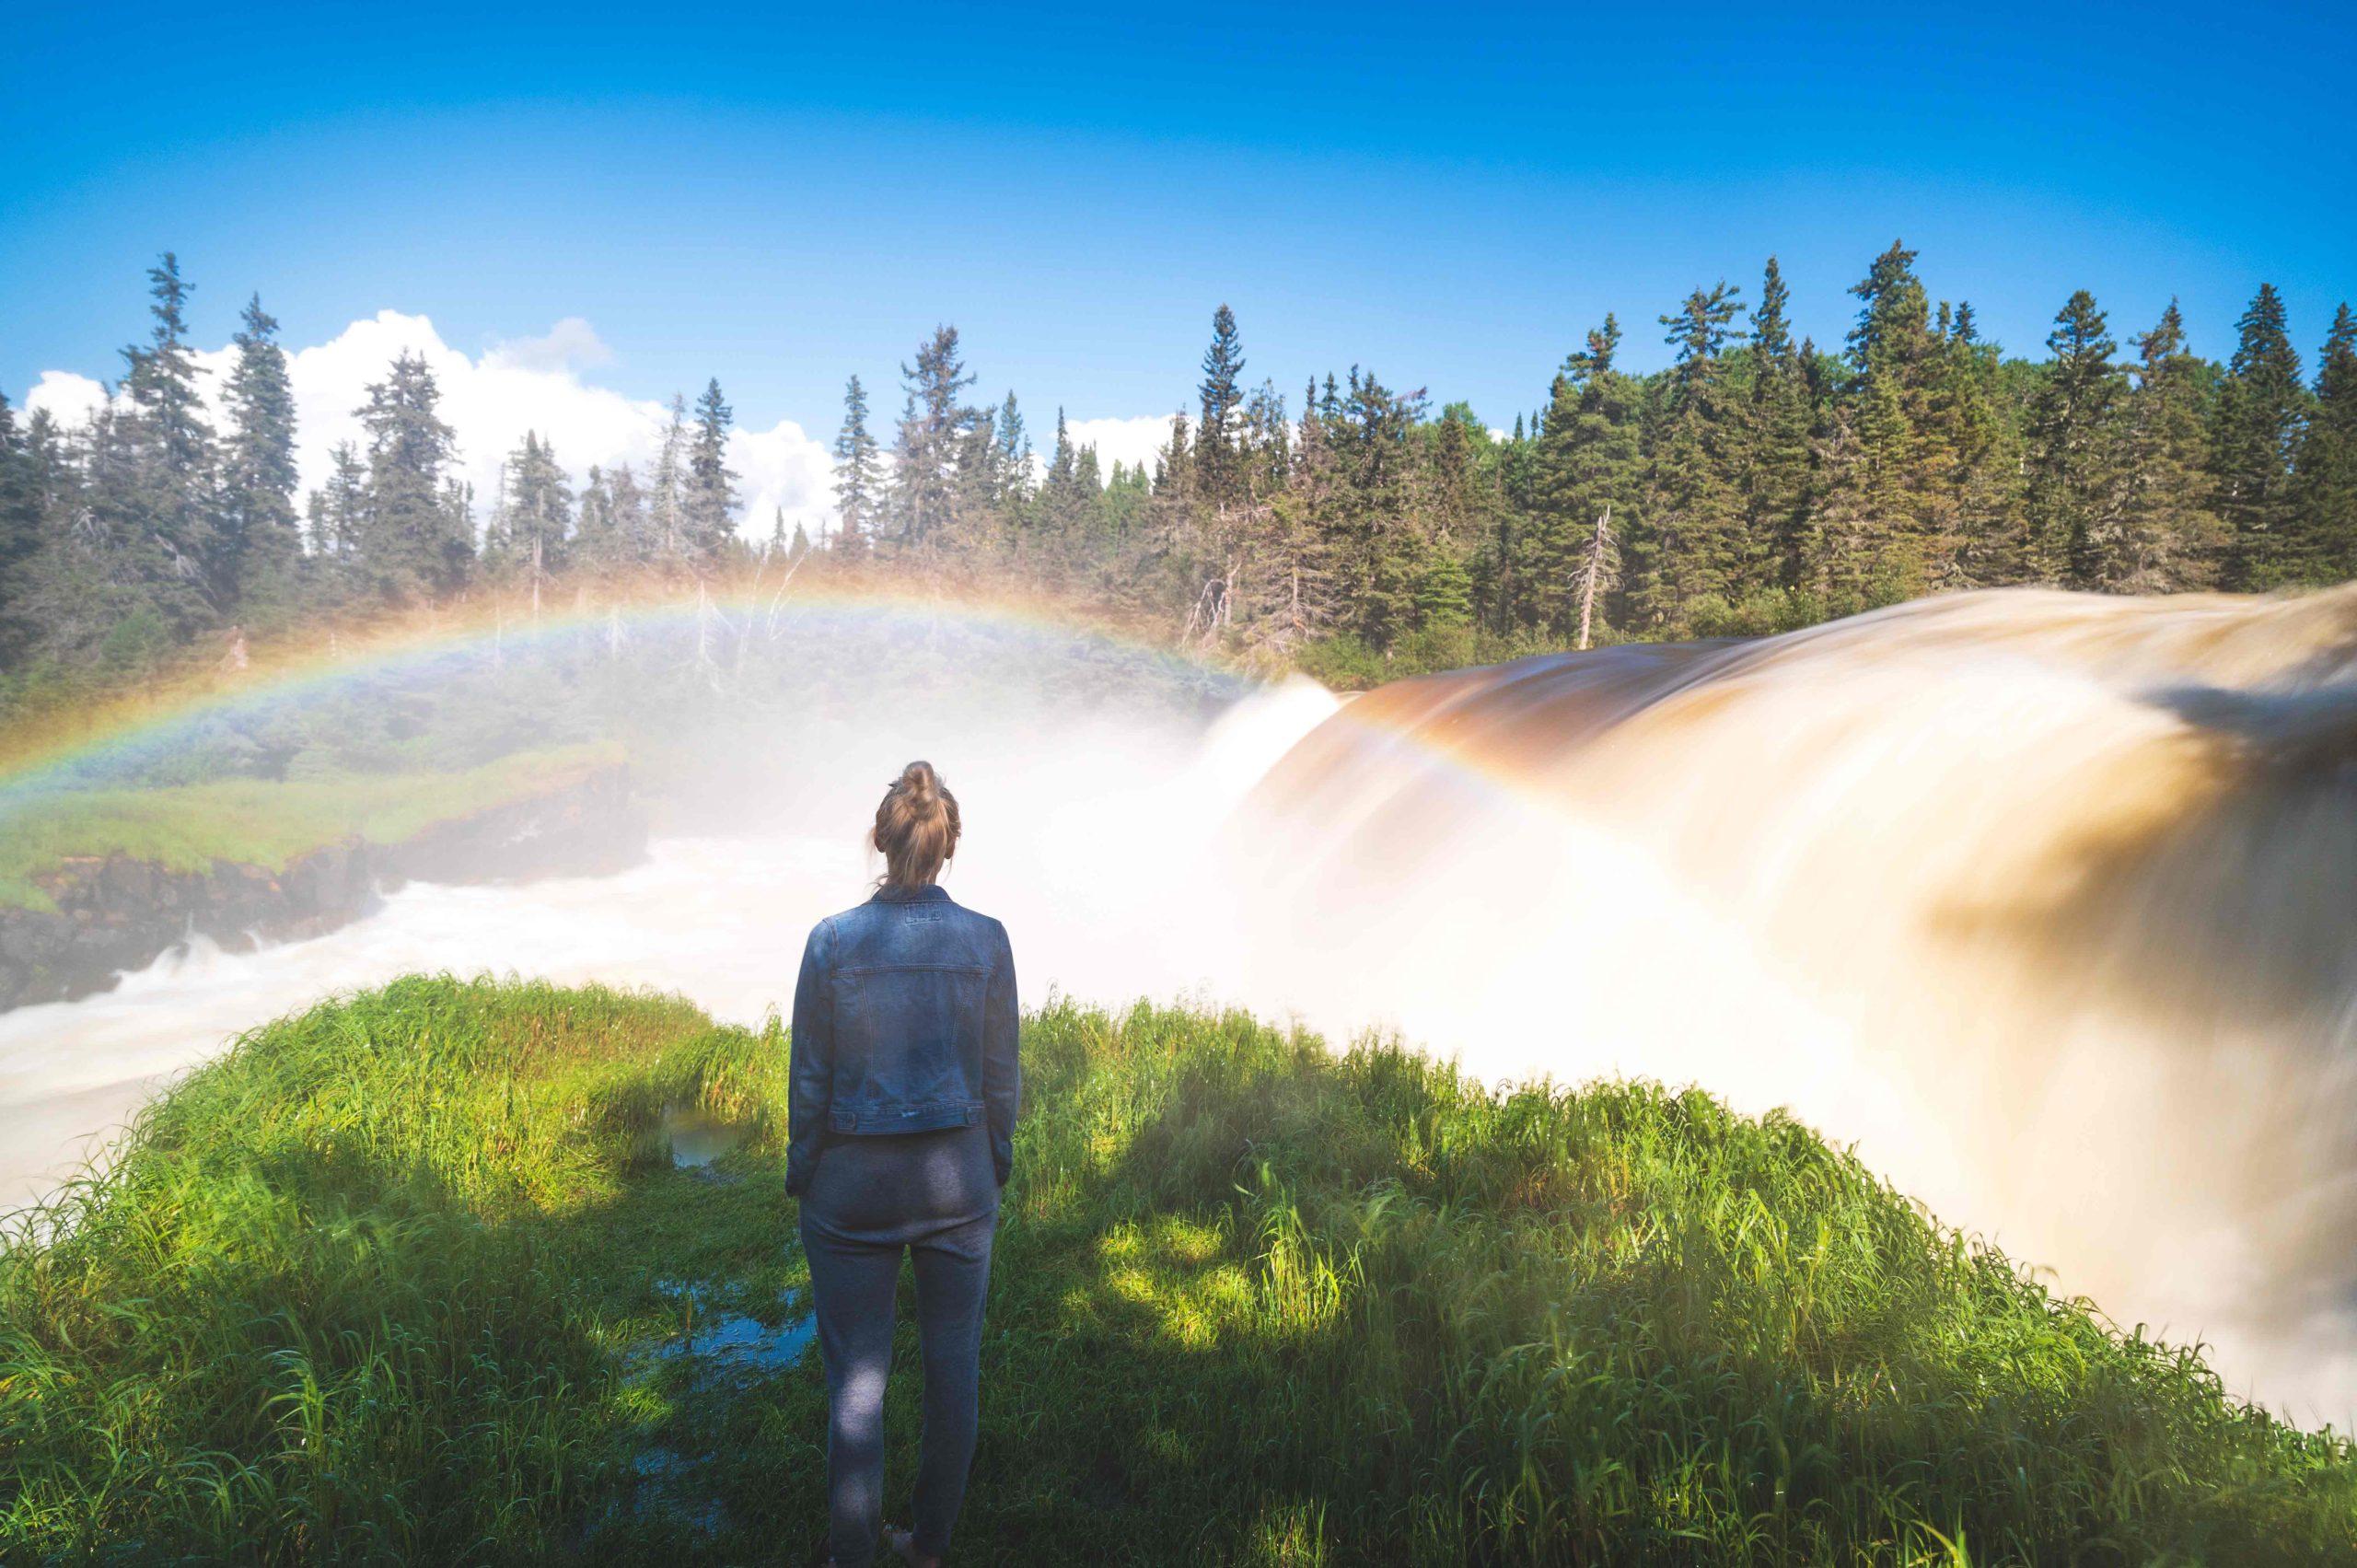 Avery Kash looking at waterfall and rainbow.